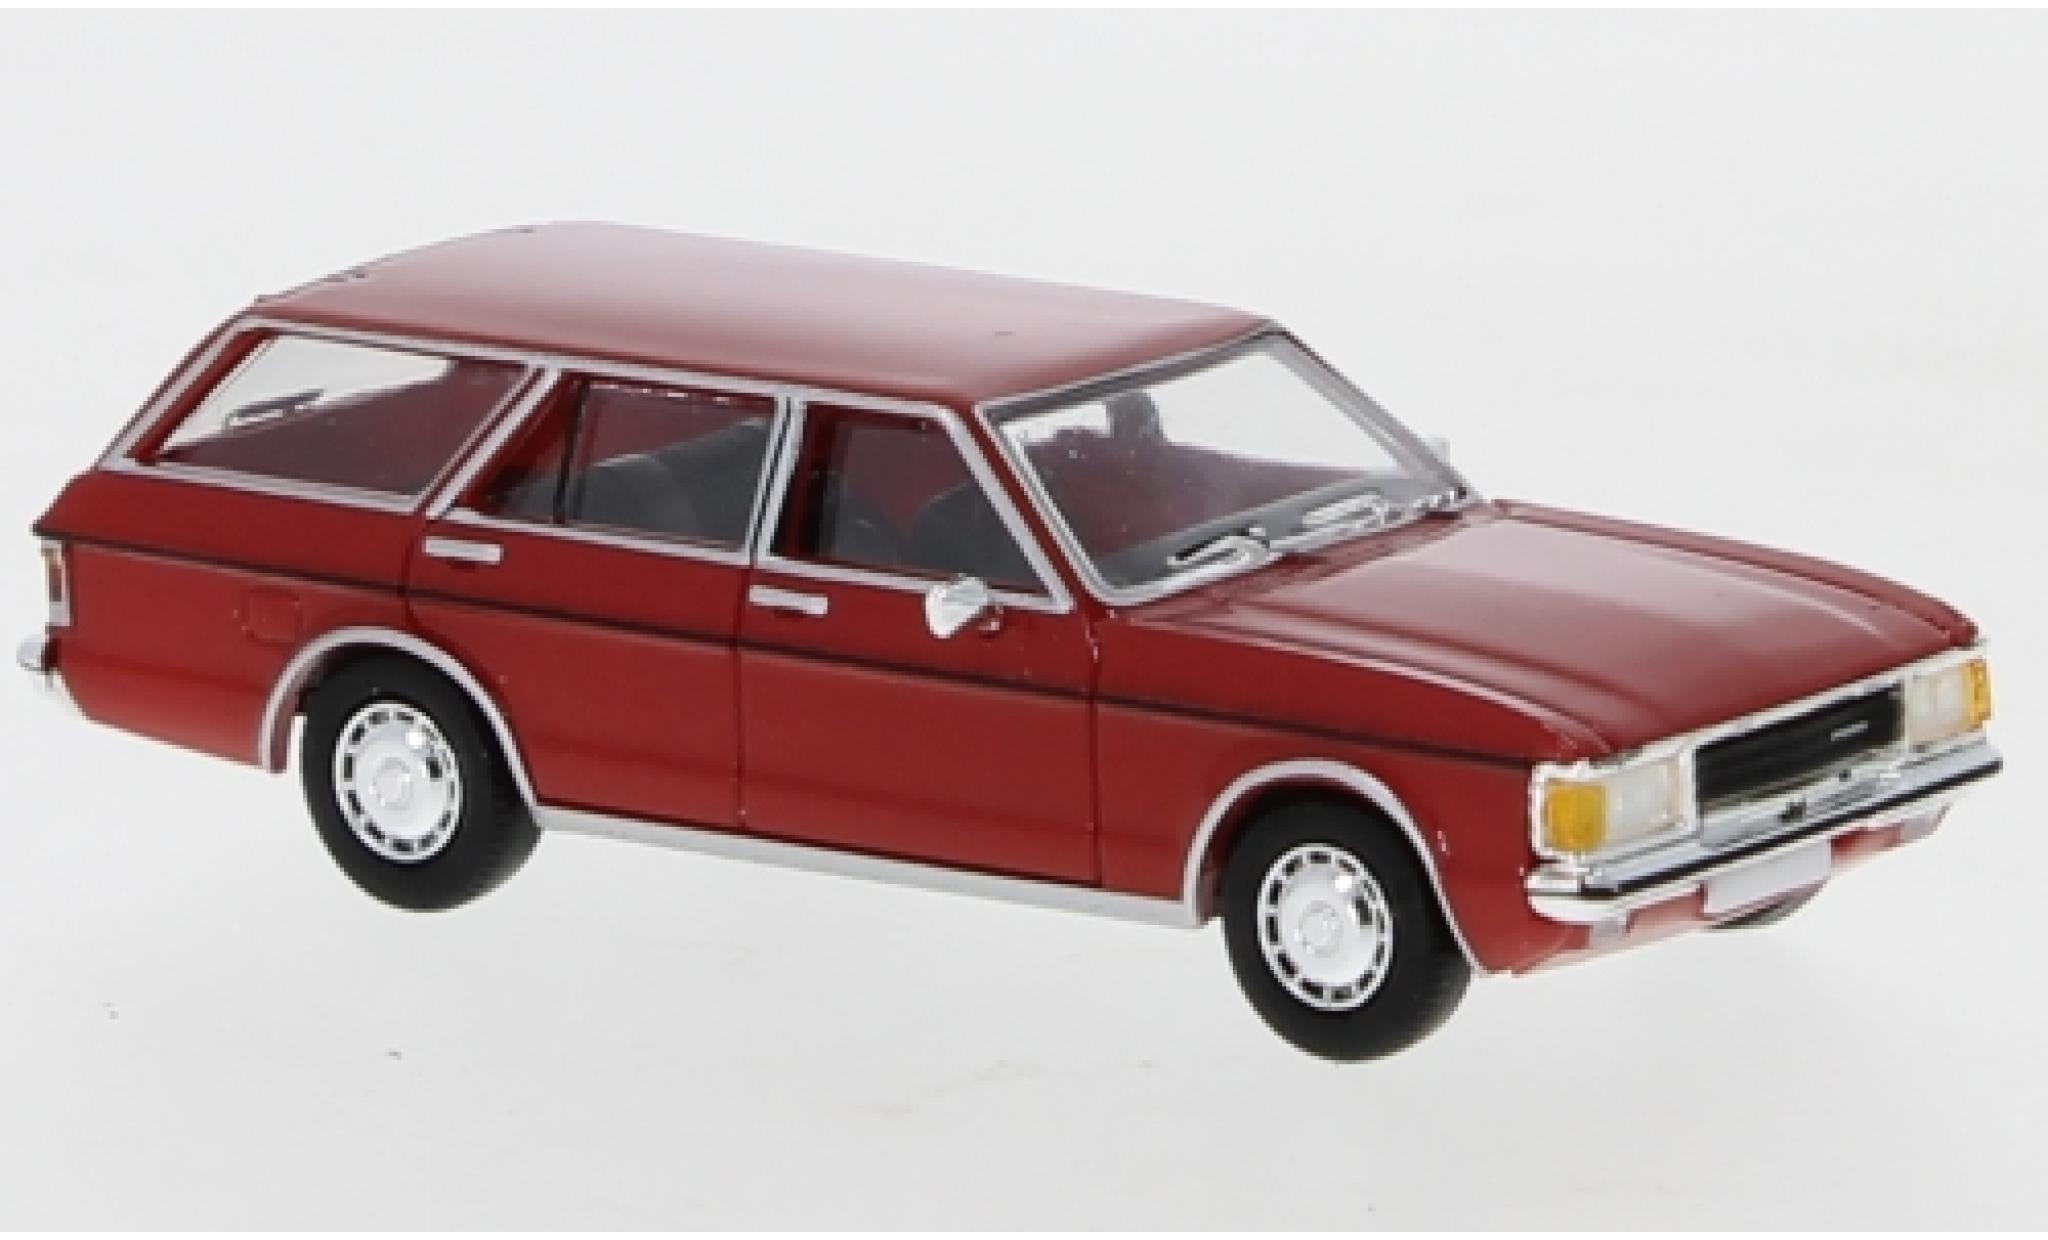 Ford Granada 1/87 PCX87 MK I Turnier red 1974